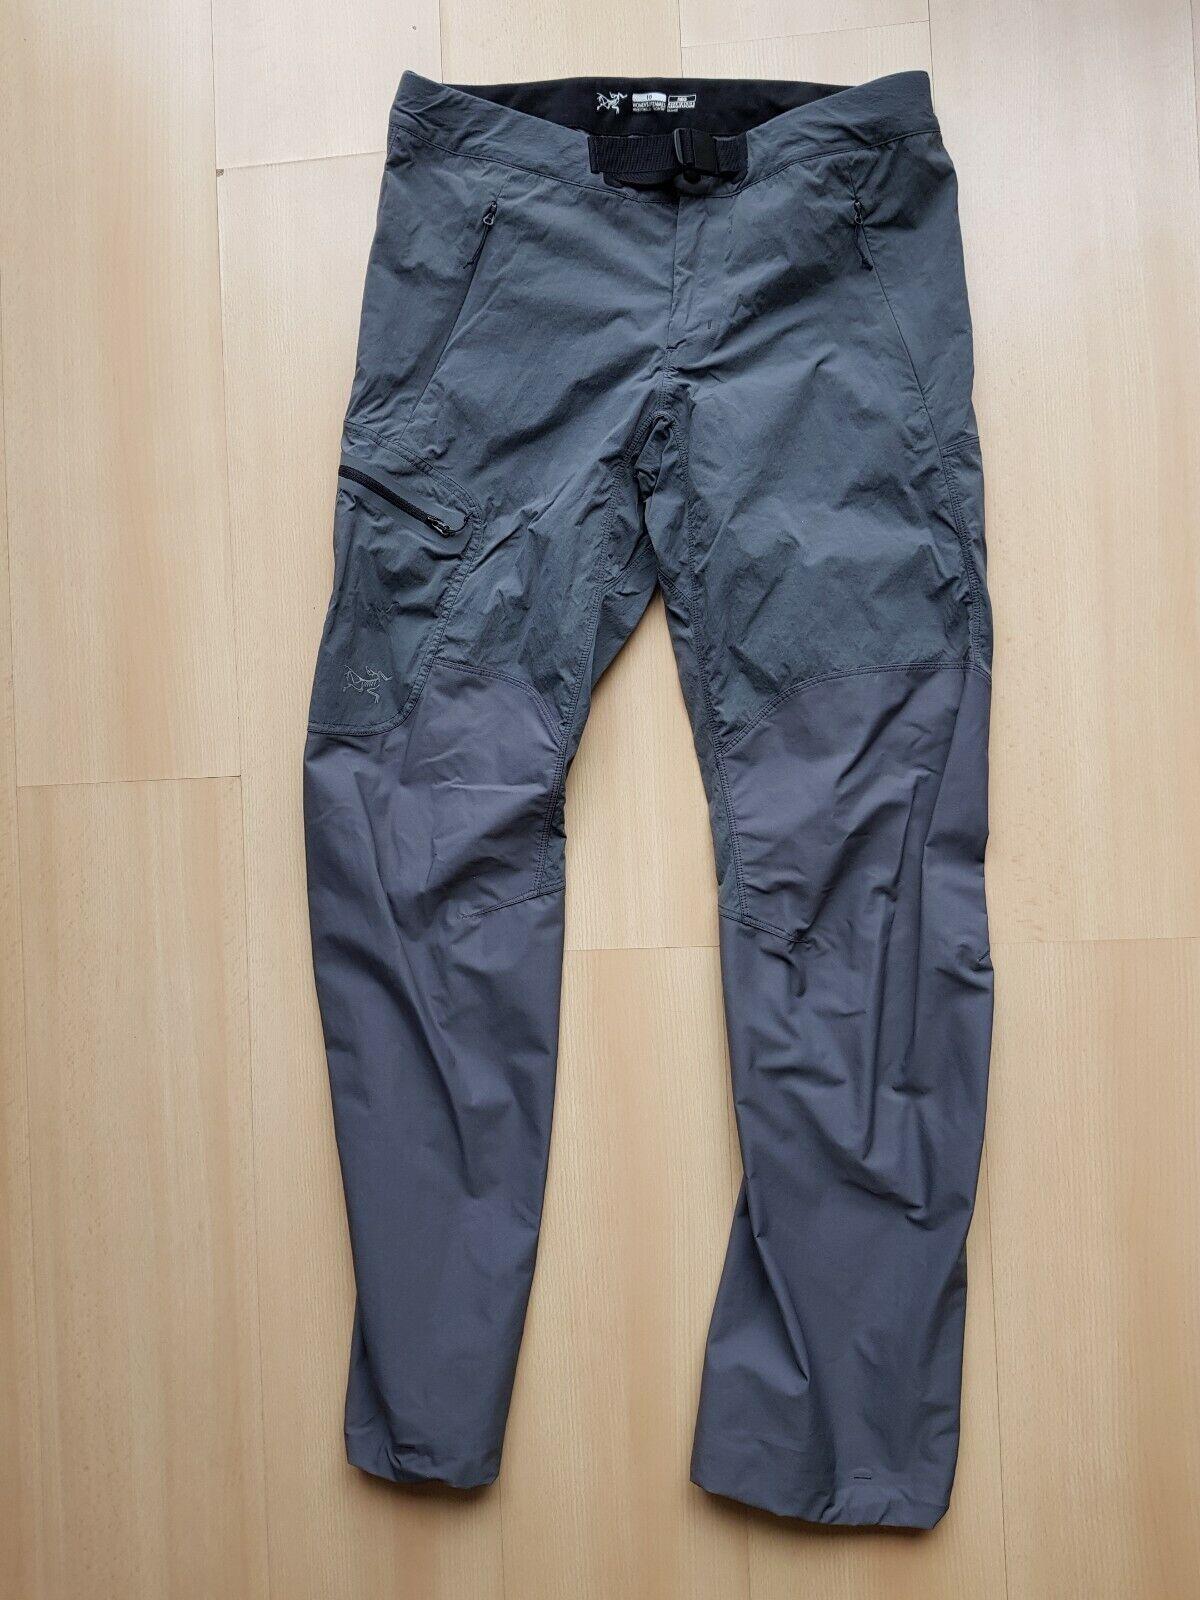 ARCTERYX Hiking Pants Softshell Trousers Women's Size 10, US 30